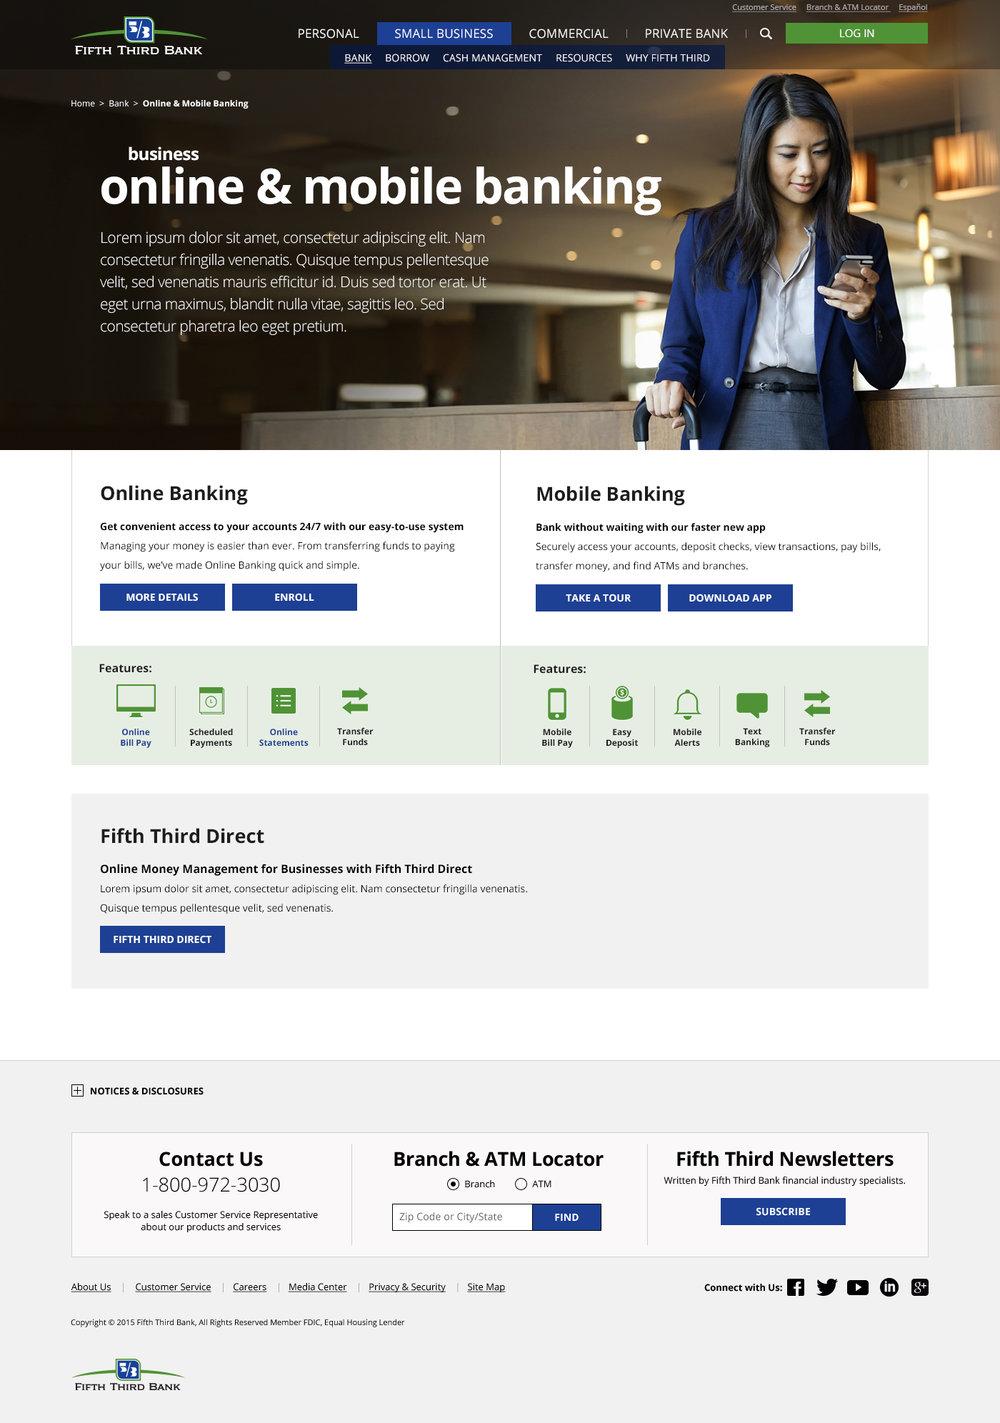 53_Set2_Desktop_3D_Business_Bank_OnlineAndMobile_Online&MobileBankingLanding.jpg